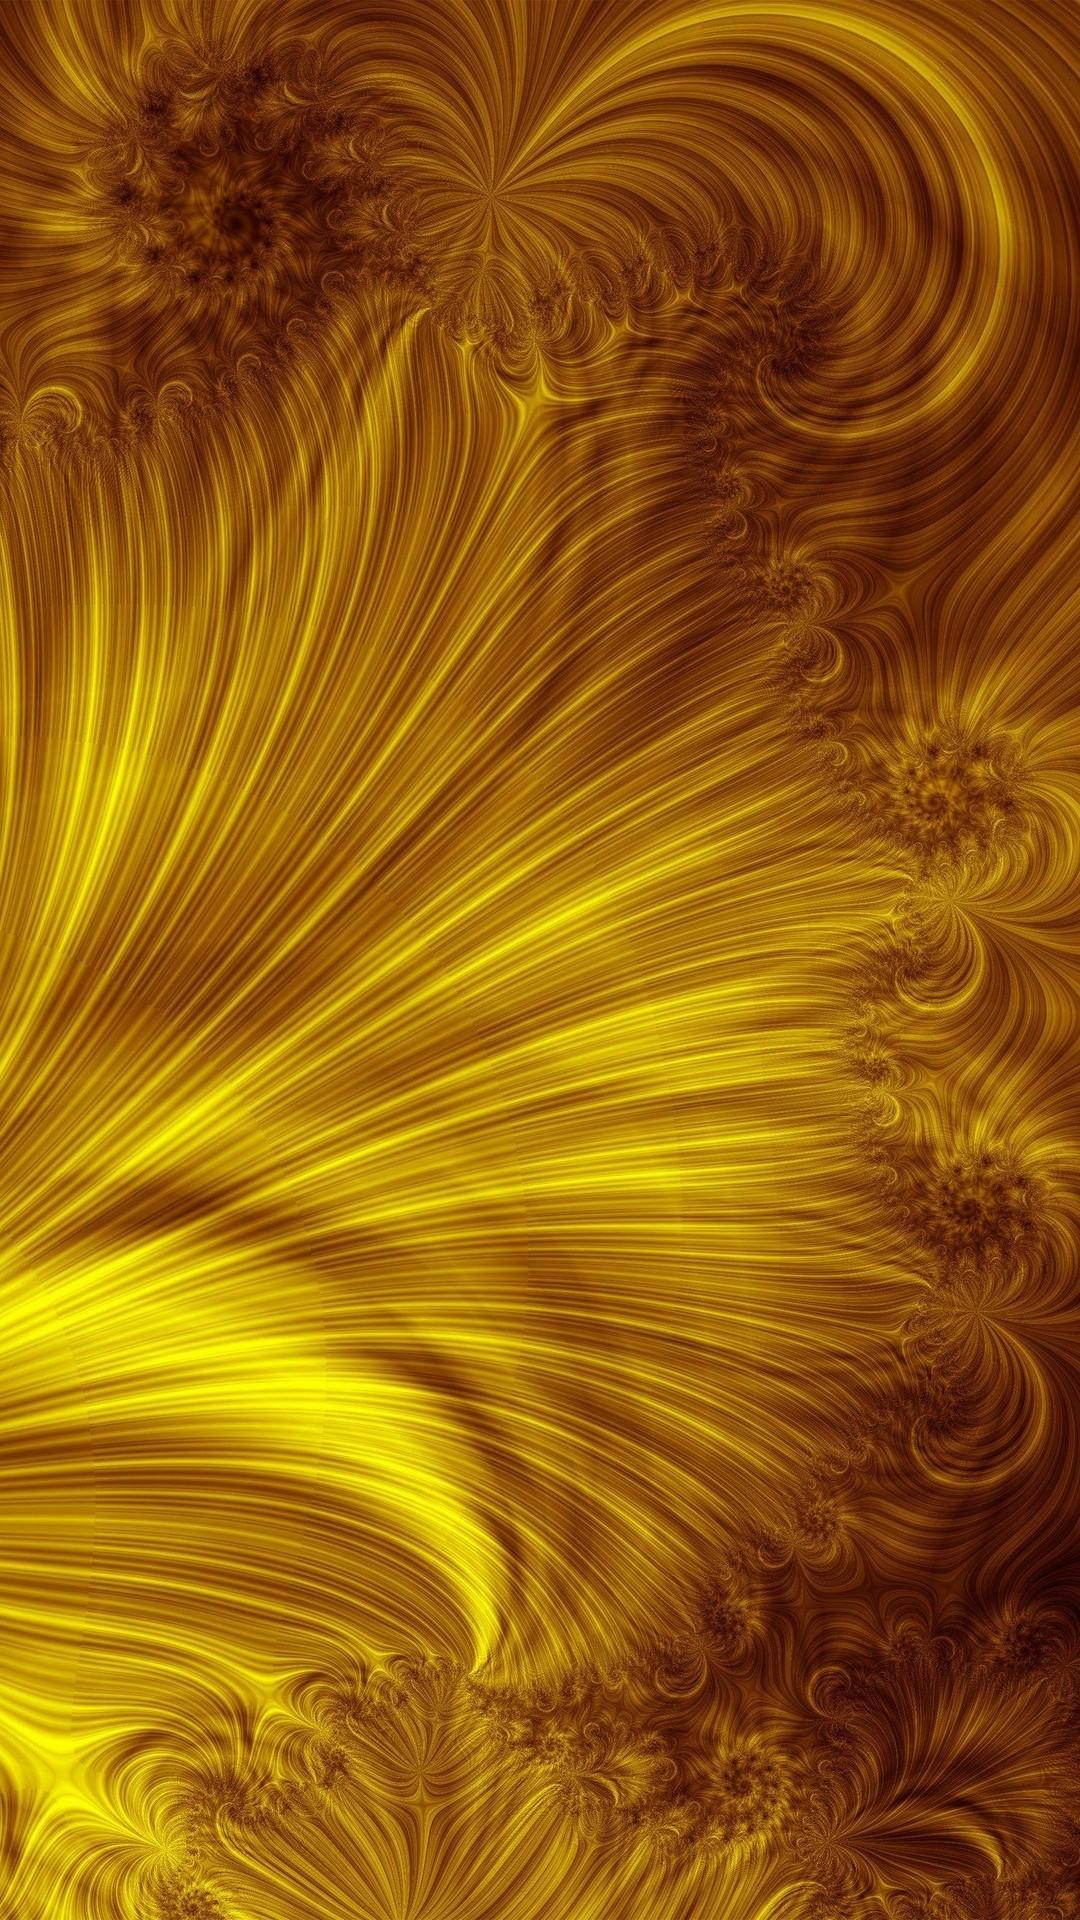 Gold iPhone 6 wallpaper